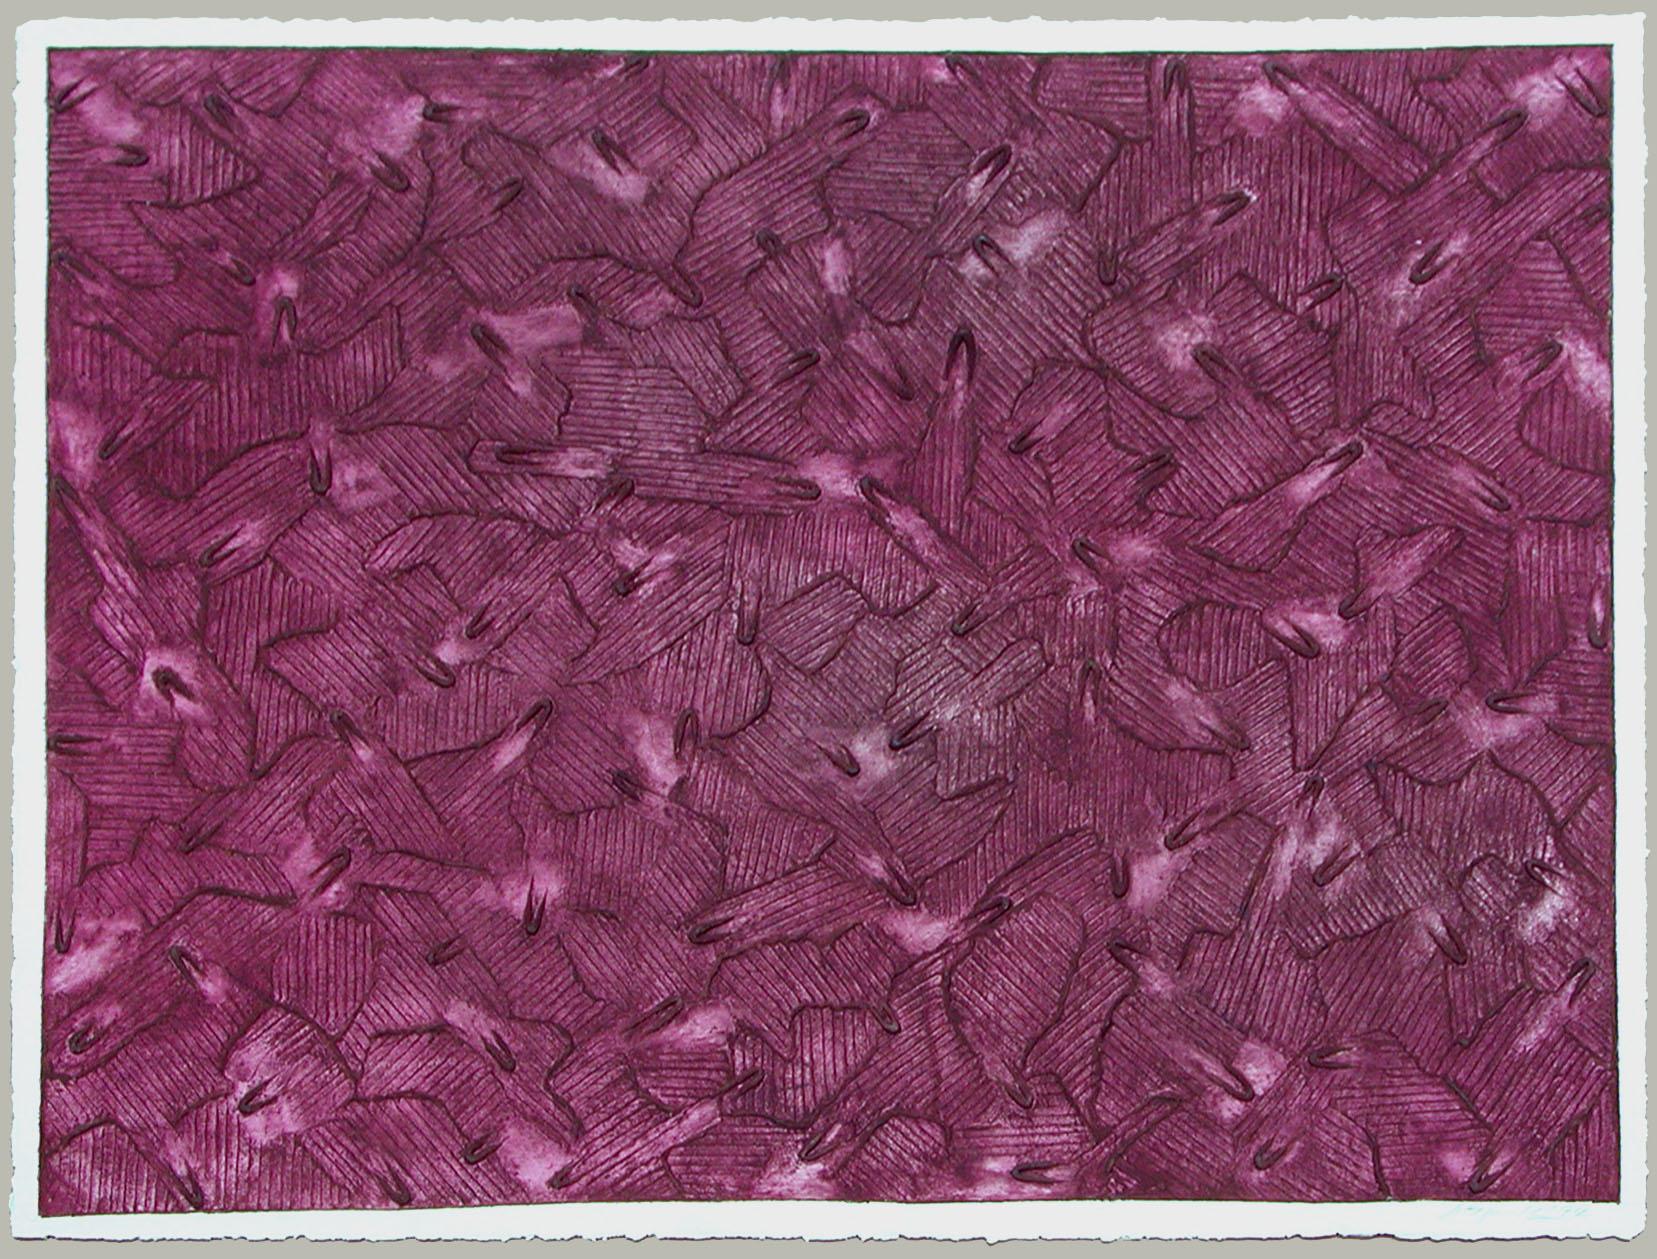 Ecriture Series IV  #28, 1994, Mixografia Monotype, 76 x 101 cm